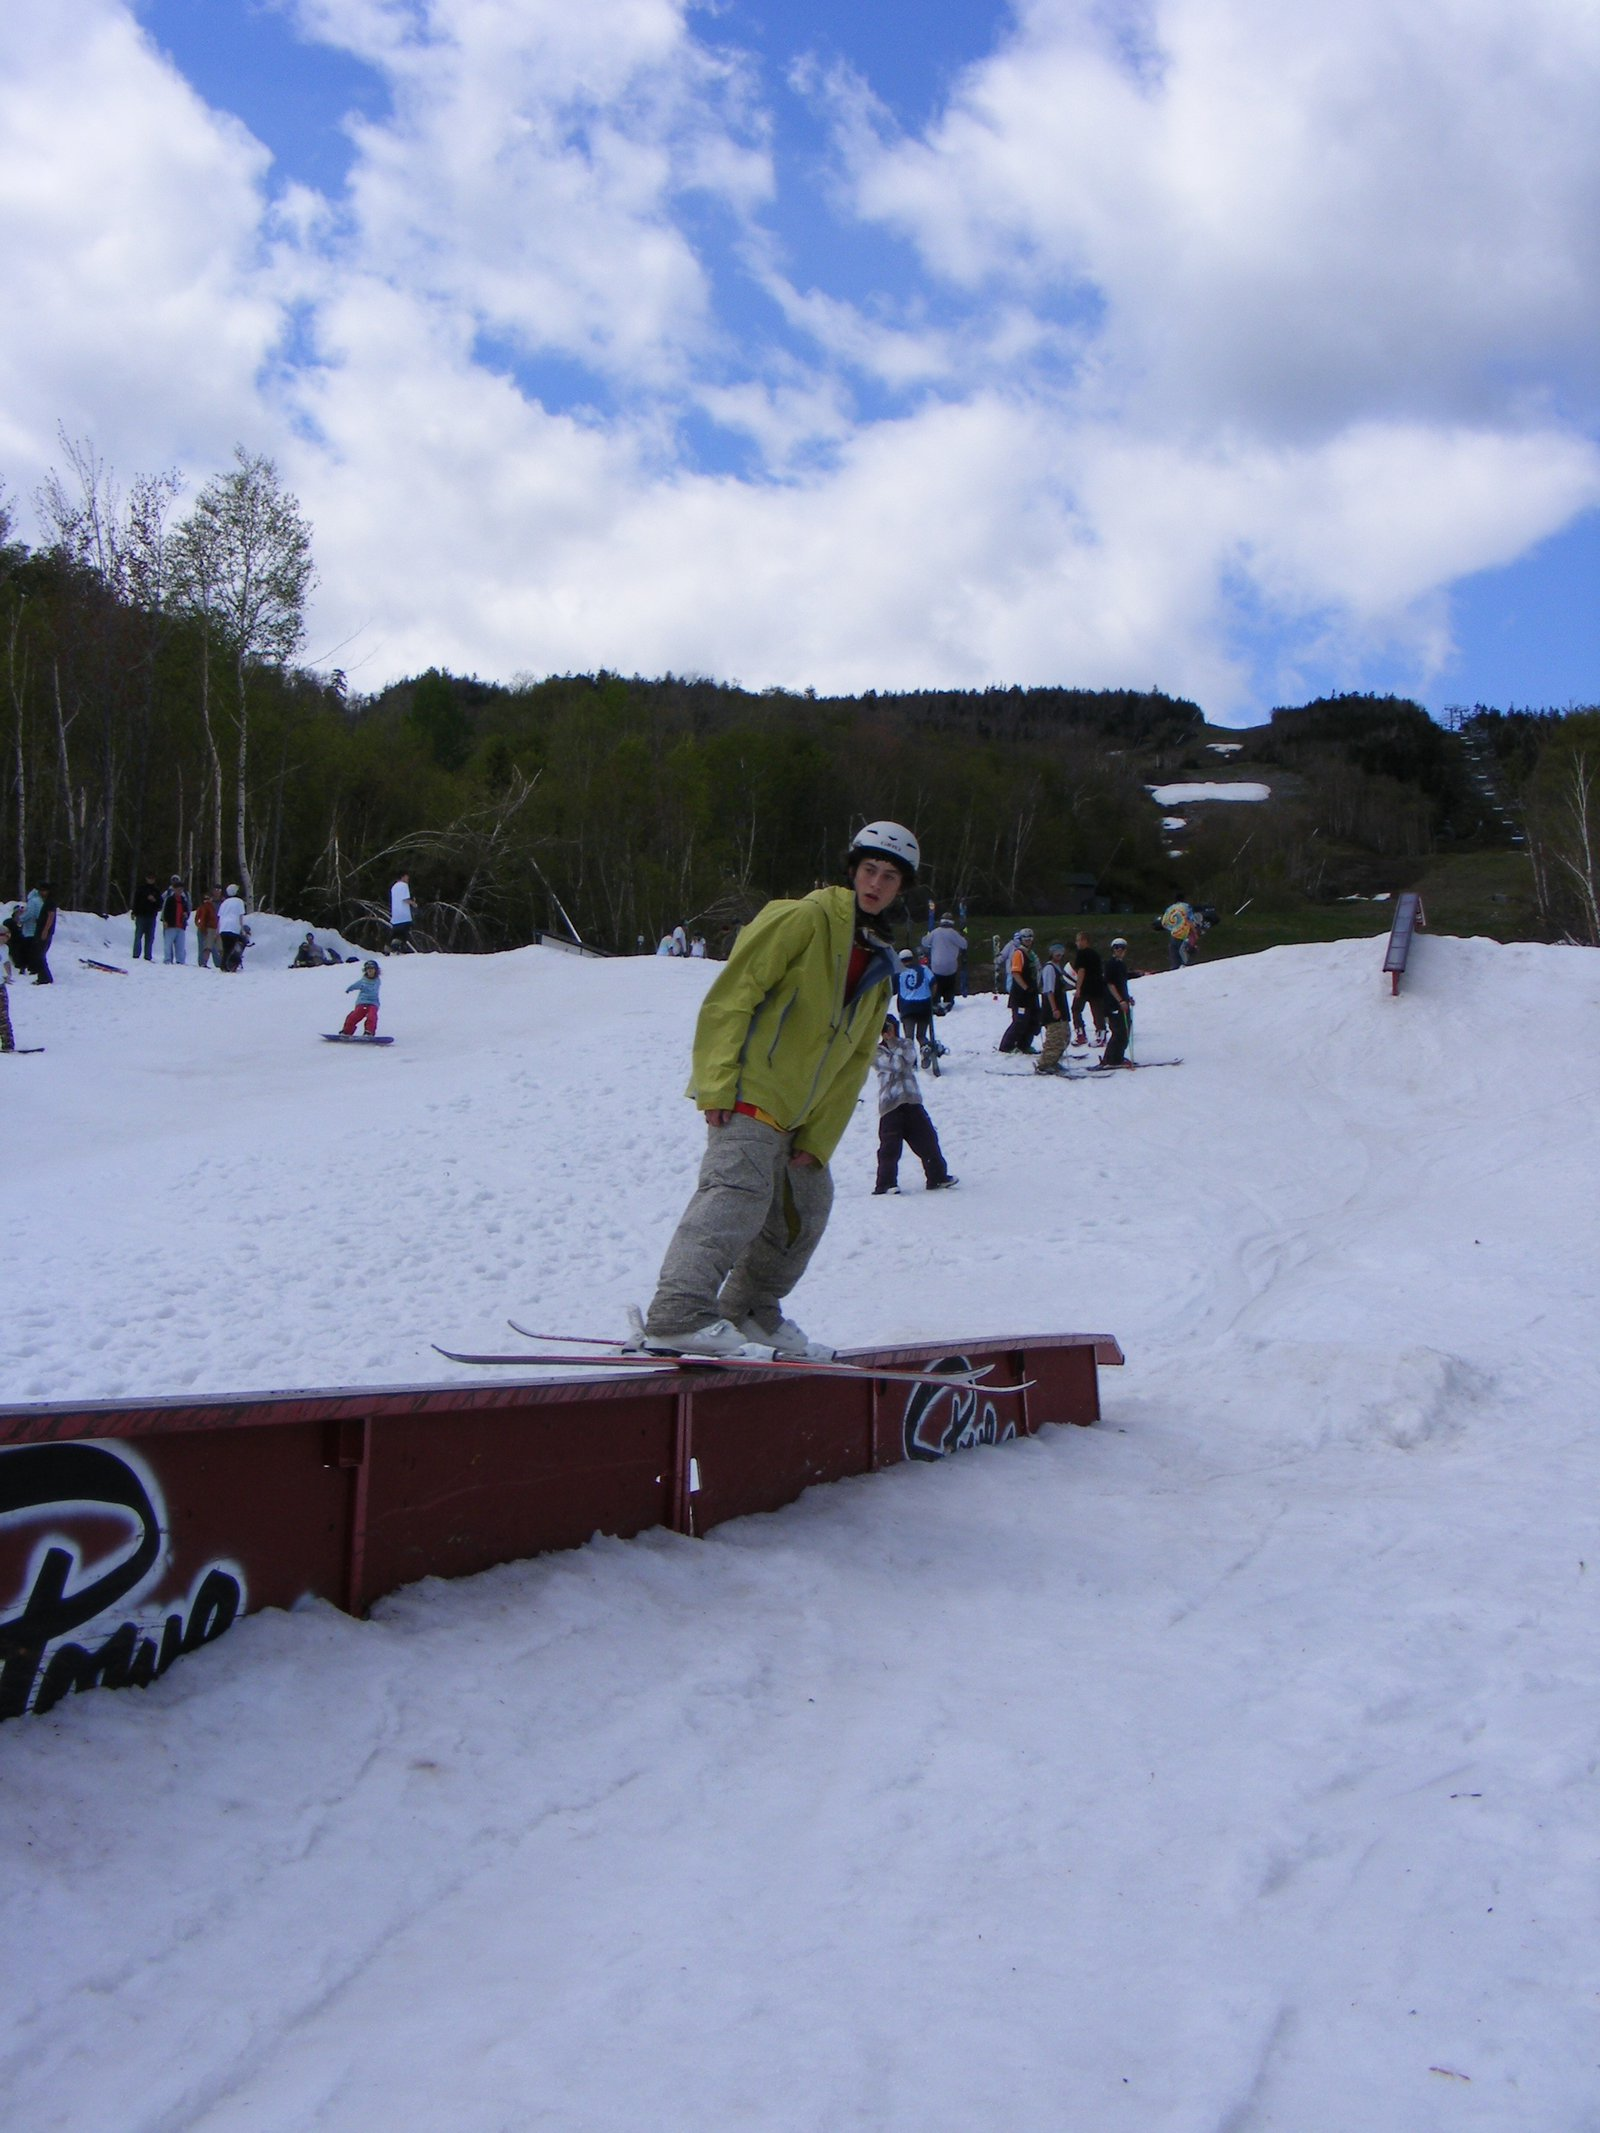 40ft flat bar -last trick rail jam